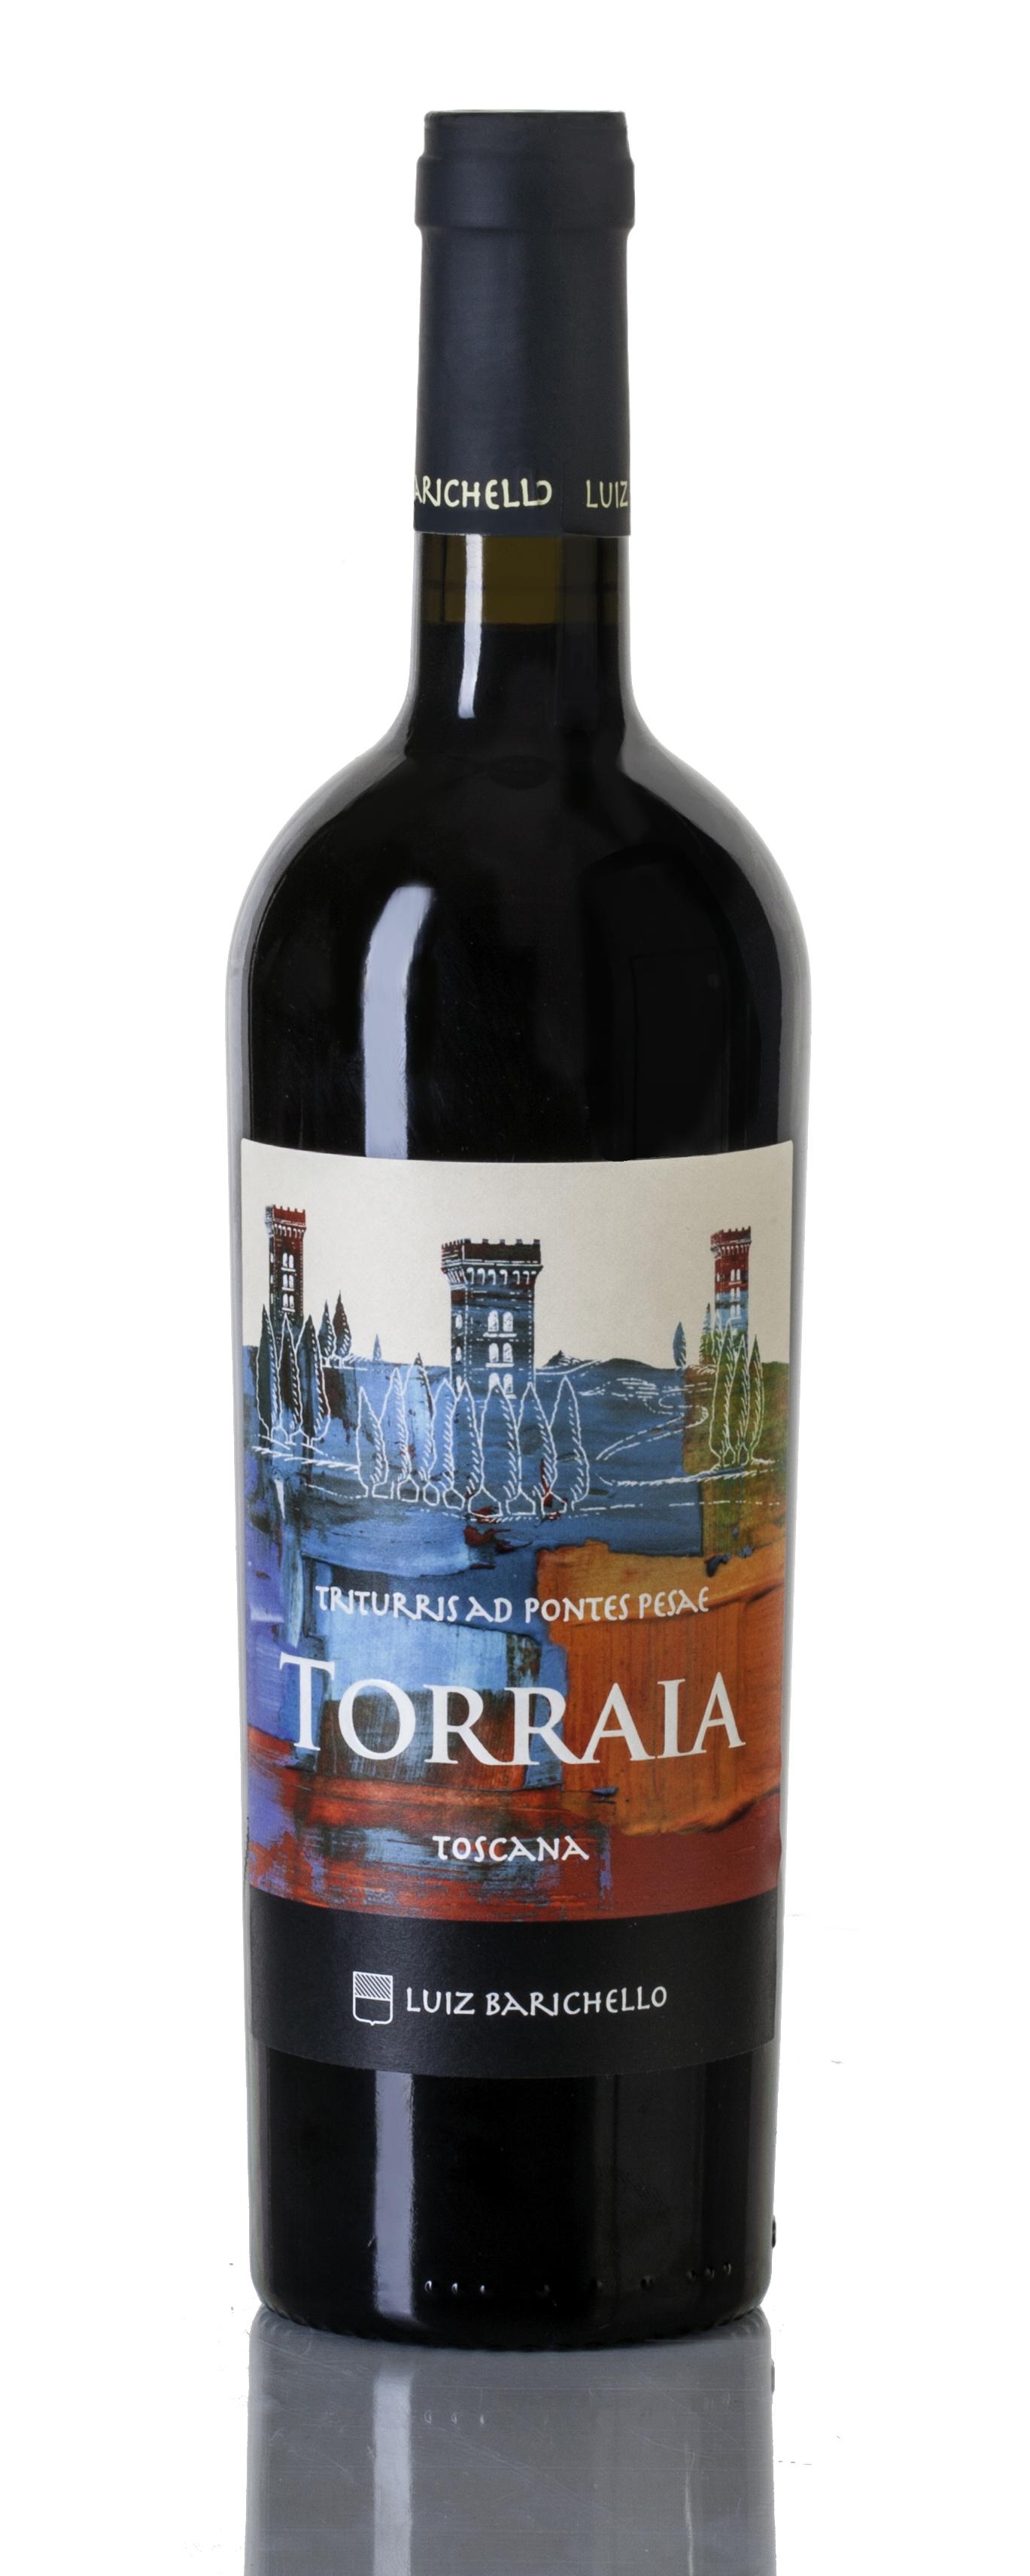 Torraia IGT Toscana